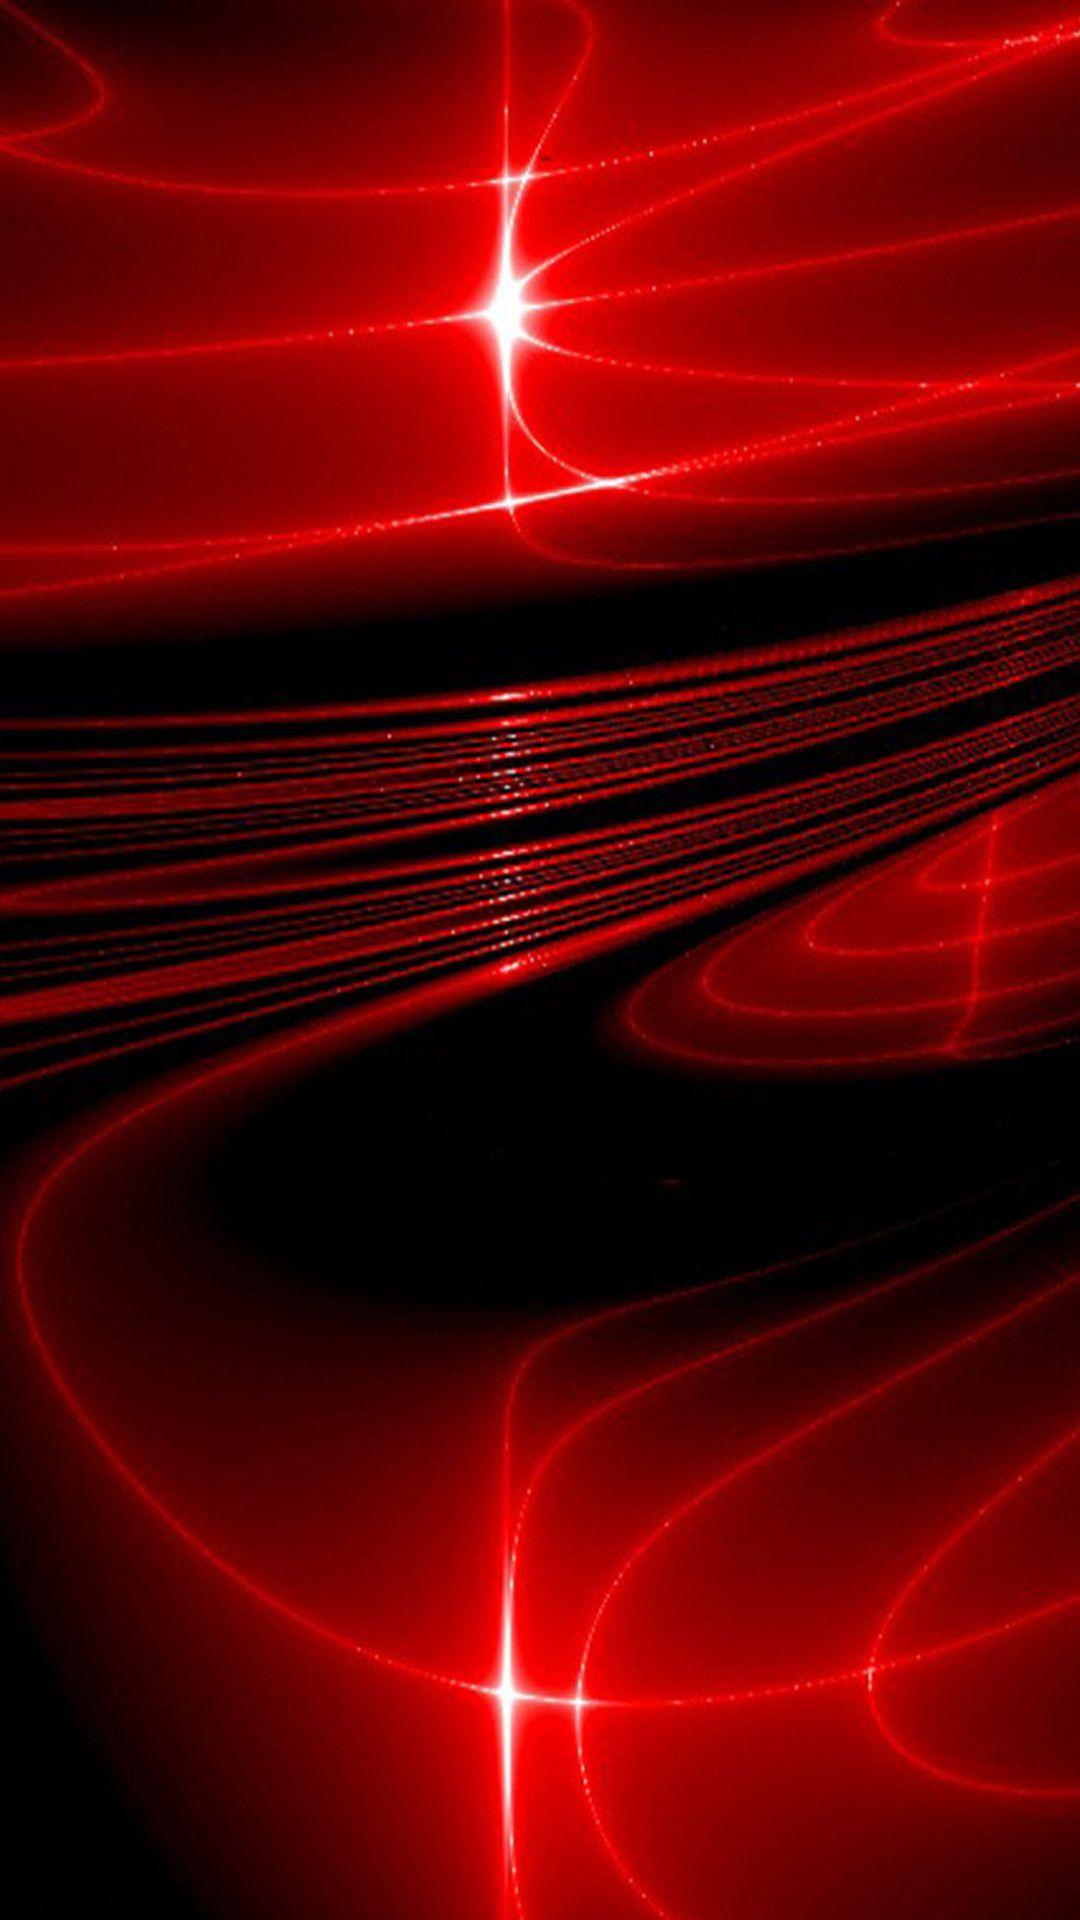 Iphone Xr Wallpaper 4k Red | Galaxy wallpaper, Latar ...